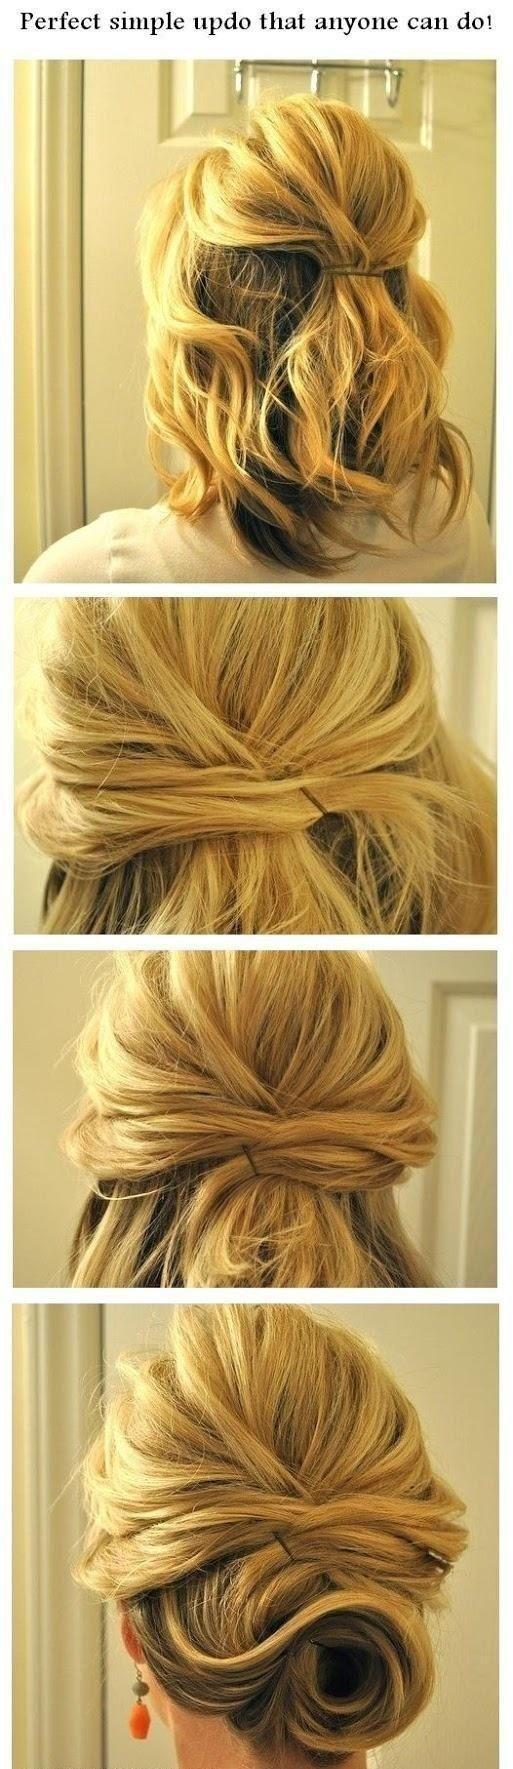 short updo hairstyles ideas anyone can do short updo